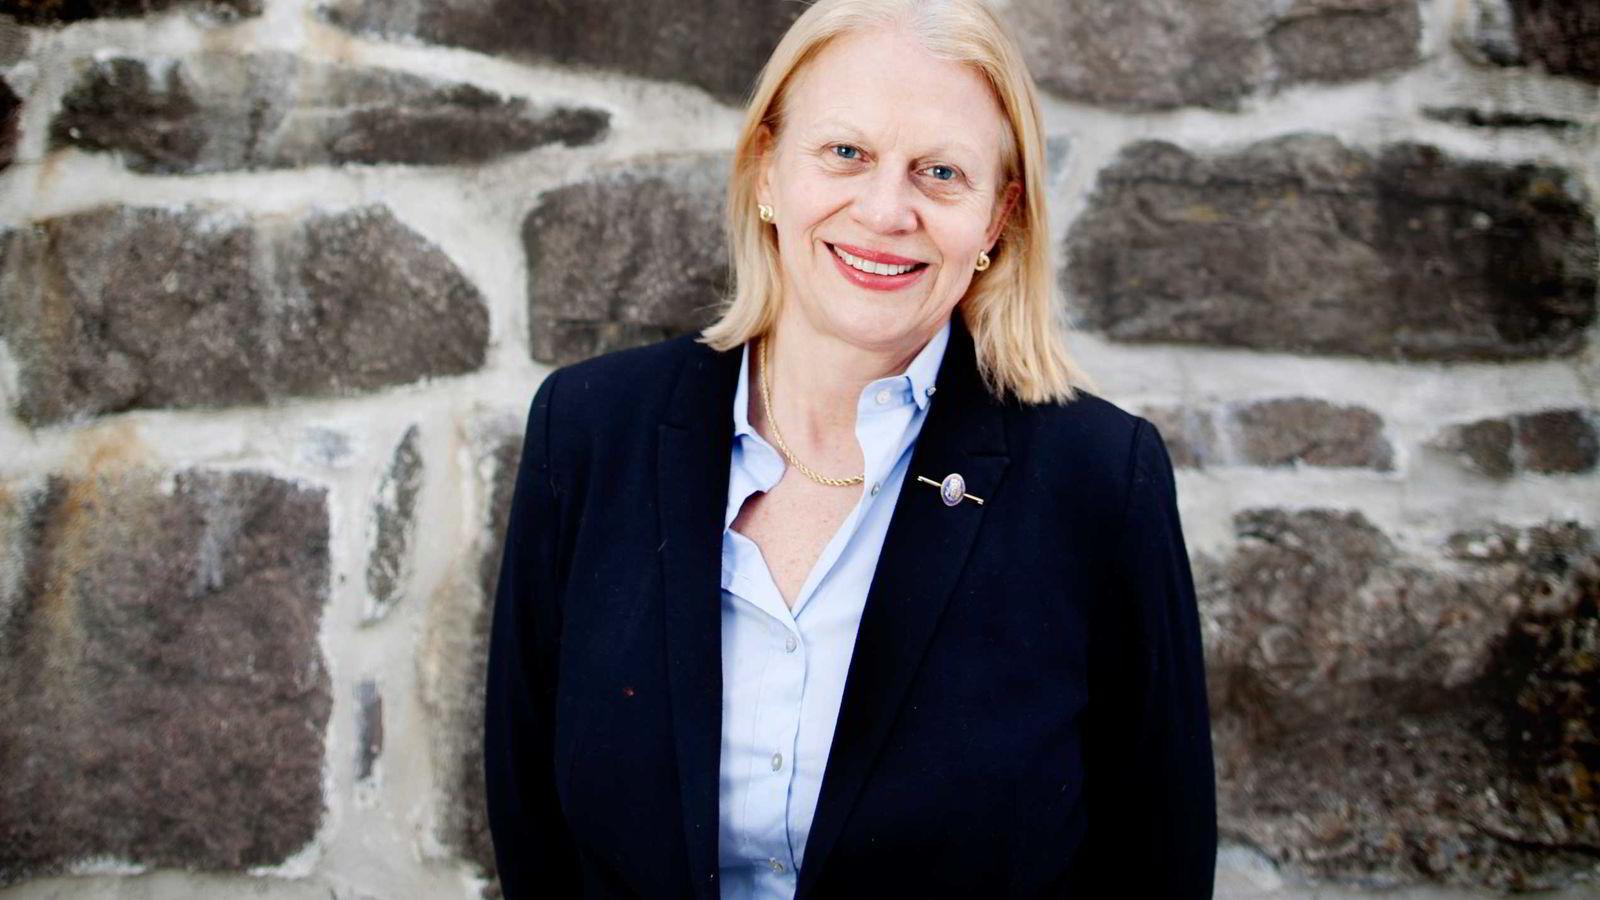 Janne Haaland Matlary er professor i statsvitenskap ved Universitetet i Oslo. Foto: Ida von Hanno Bast